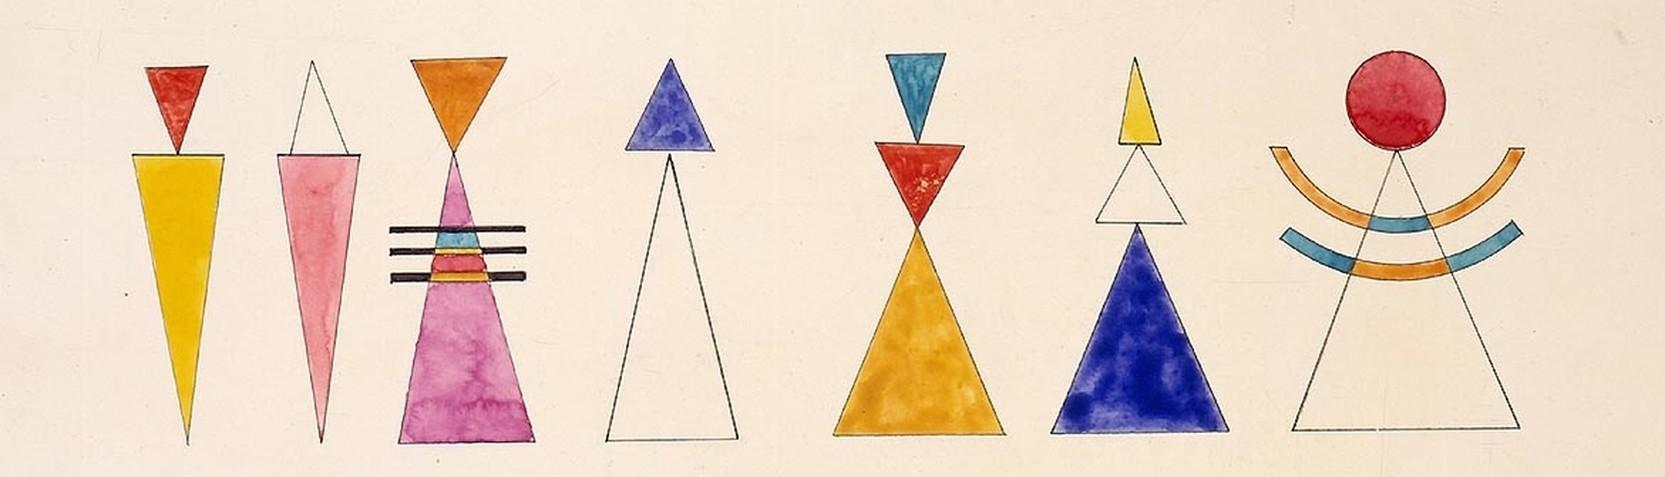 Artisti - Wassily Kandinsky